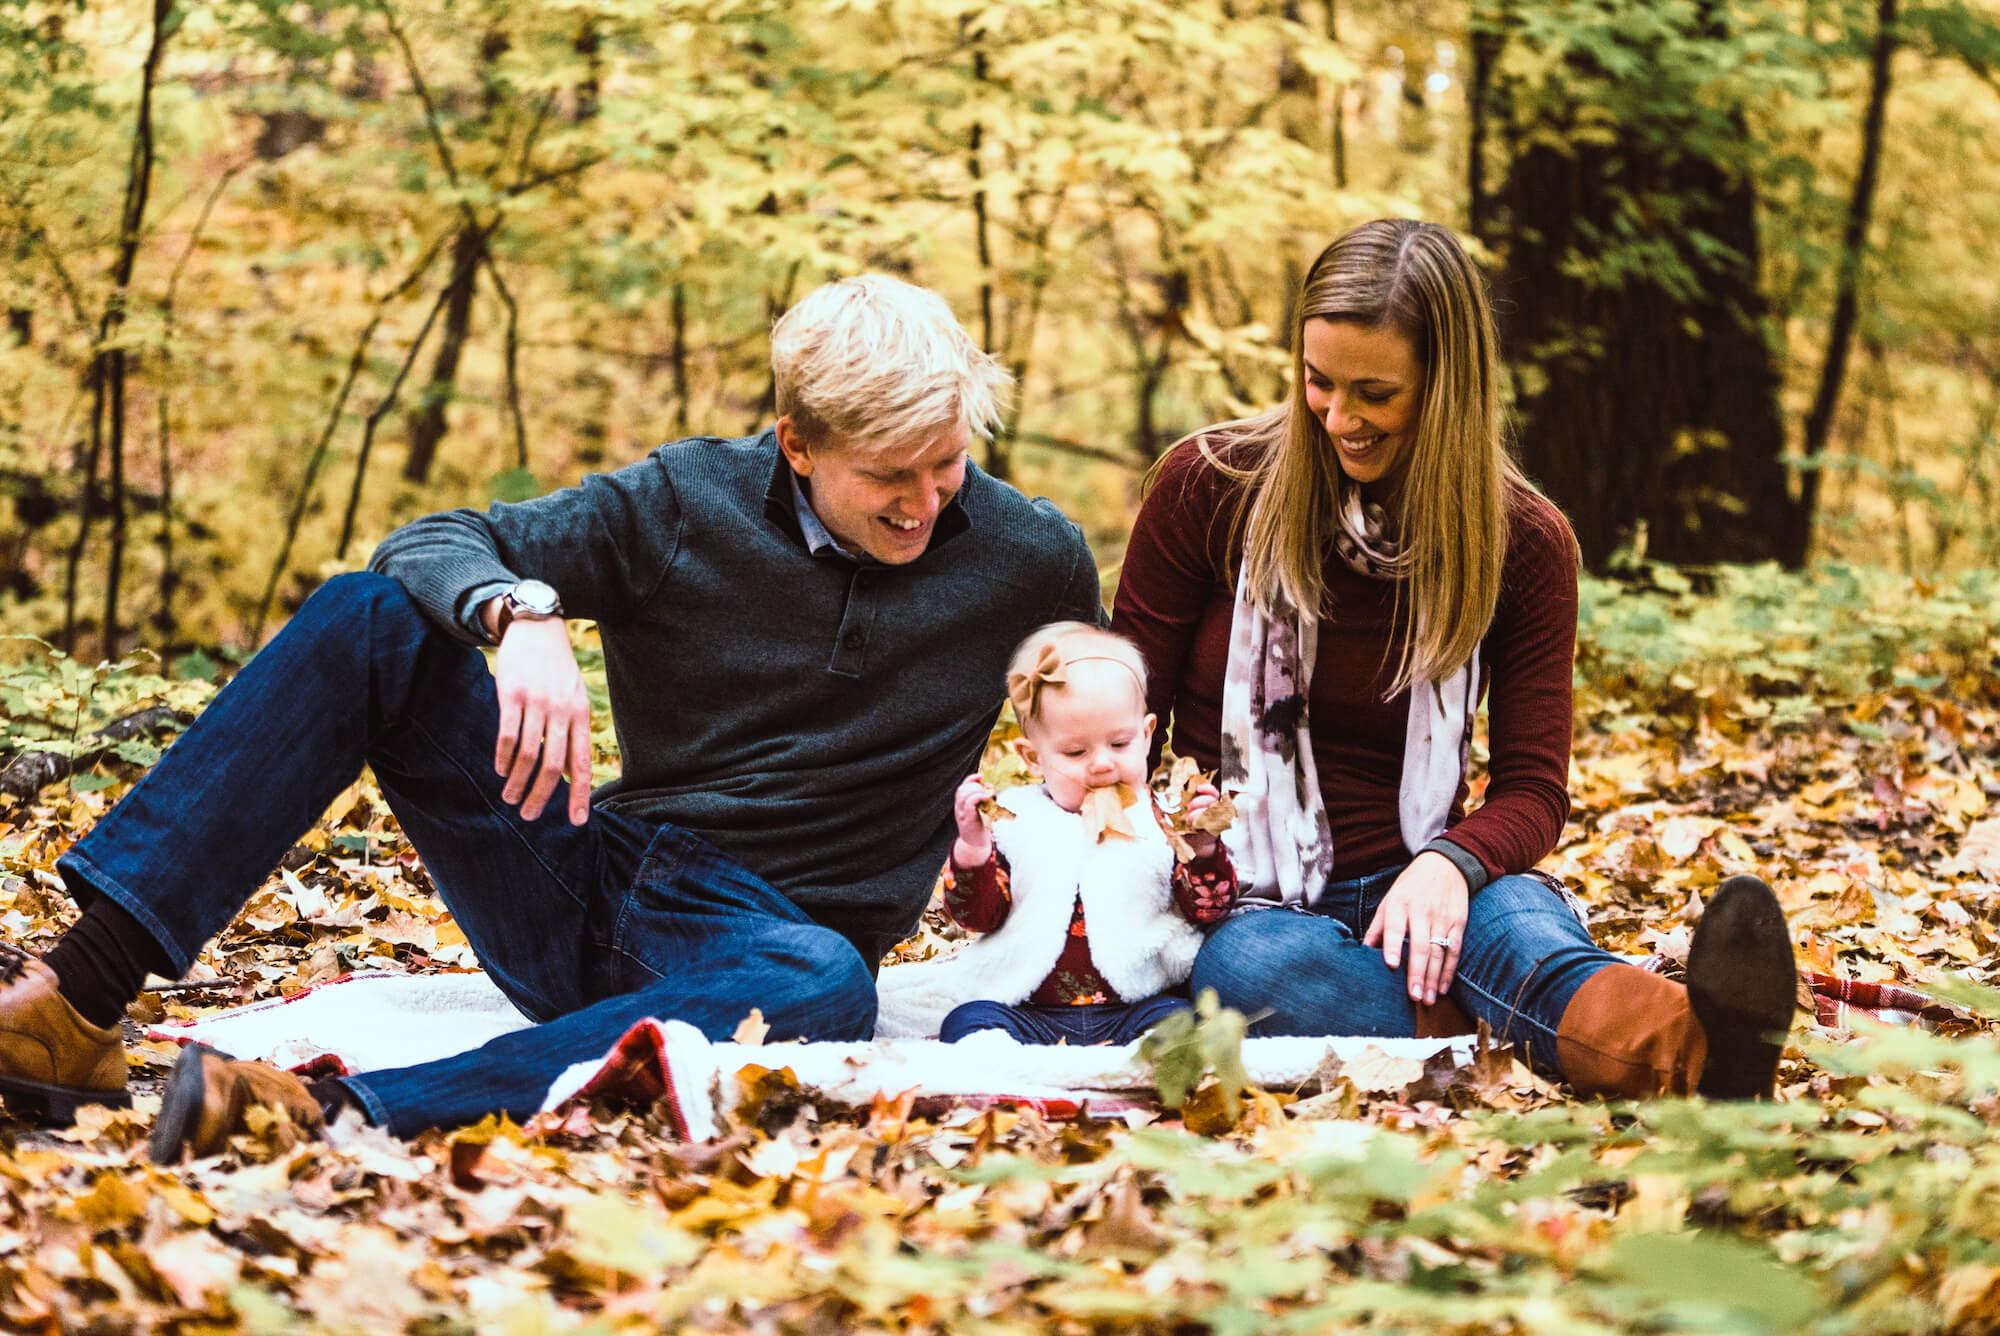 engle-olson-family-photography-session-9.jpg